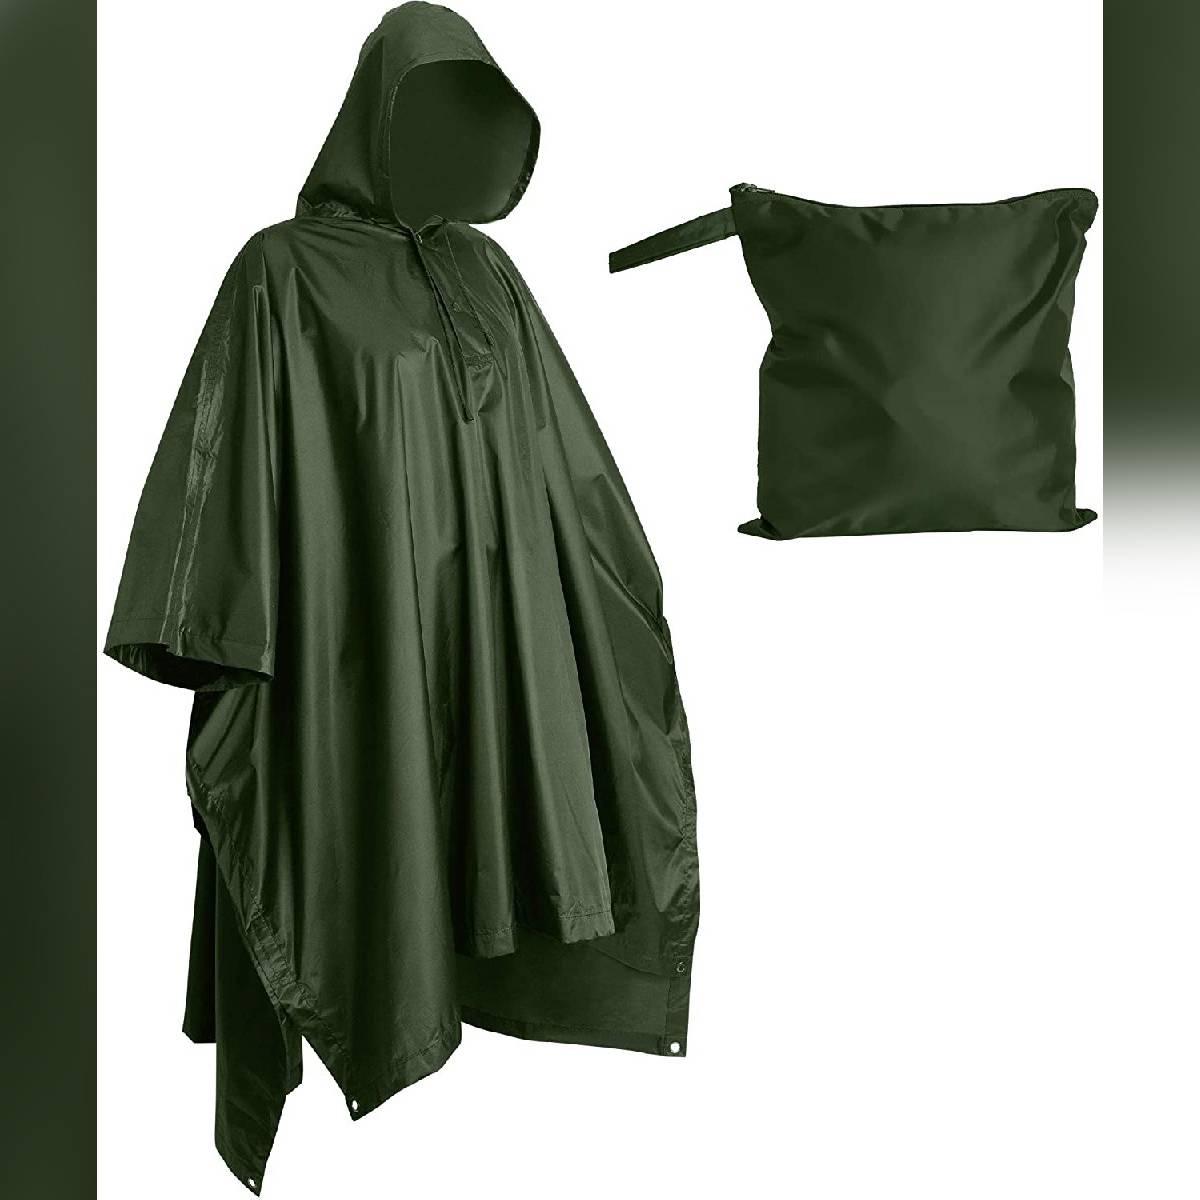 Multi-use Rain Poncho Raincoat Women Reusable Rain Coat Military Rain Jacket Packable Rainwear